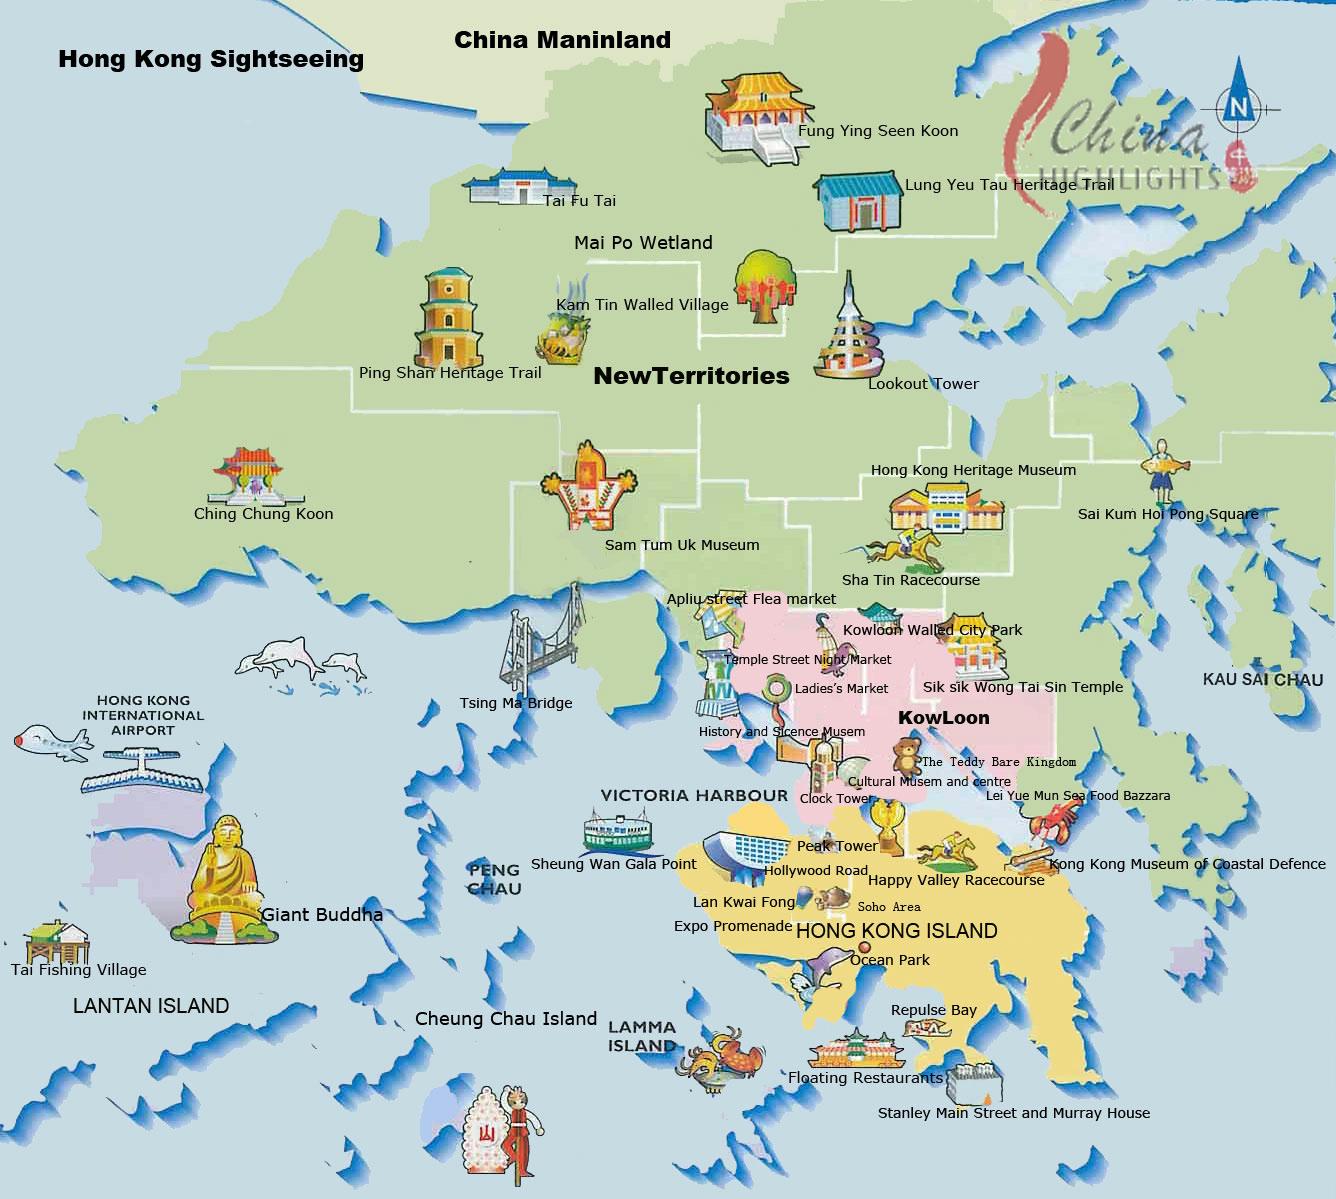 Maps of hong kong detailed map of hong kong in english tourist detailed tourist map of hong kong gumiabroncs Choice Image